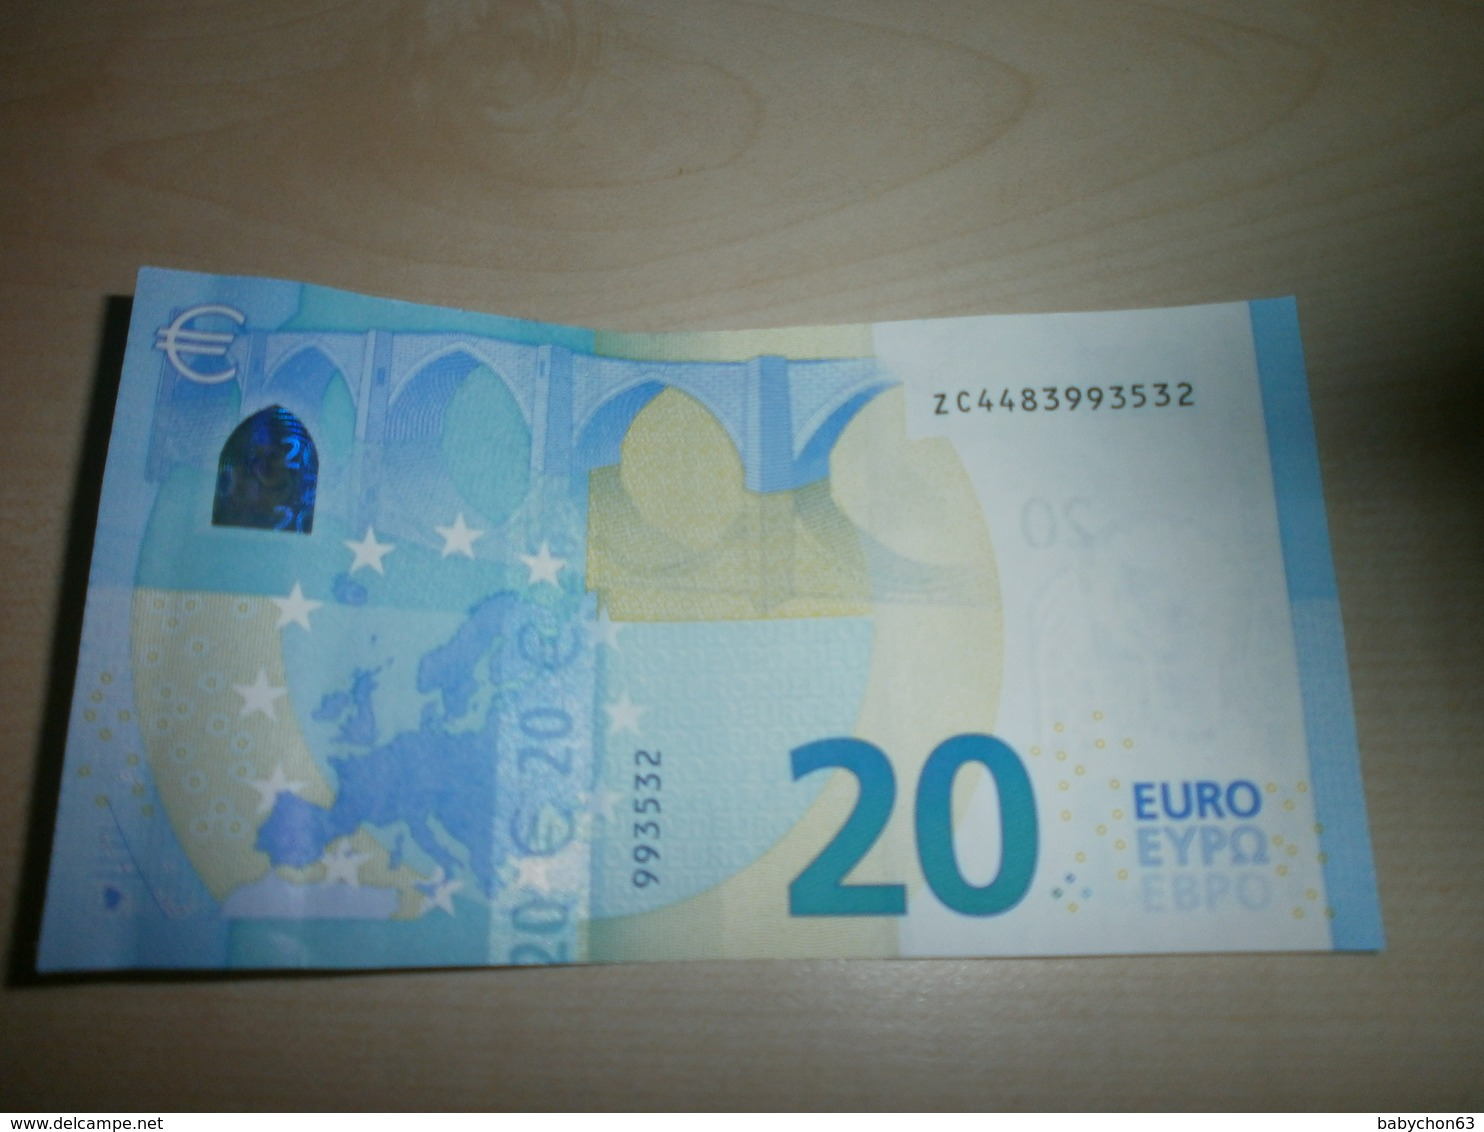 20 EUROS (Z Z020 E1) - EURO